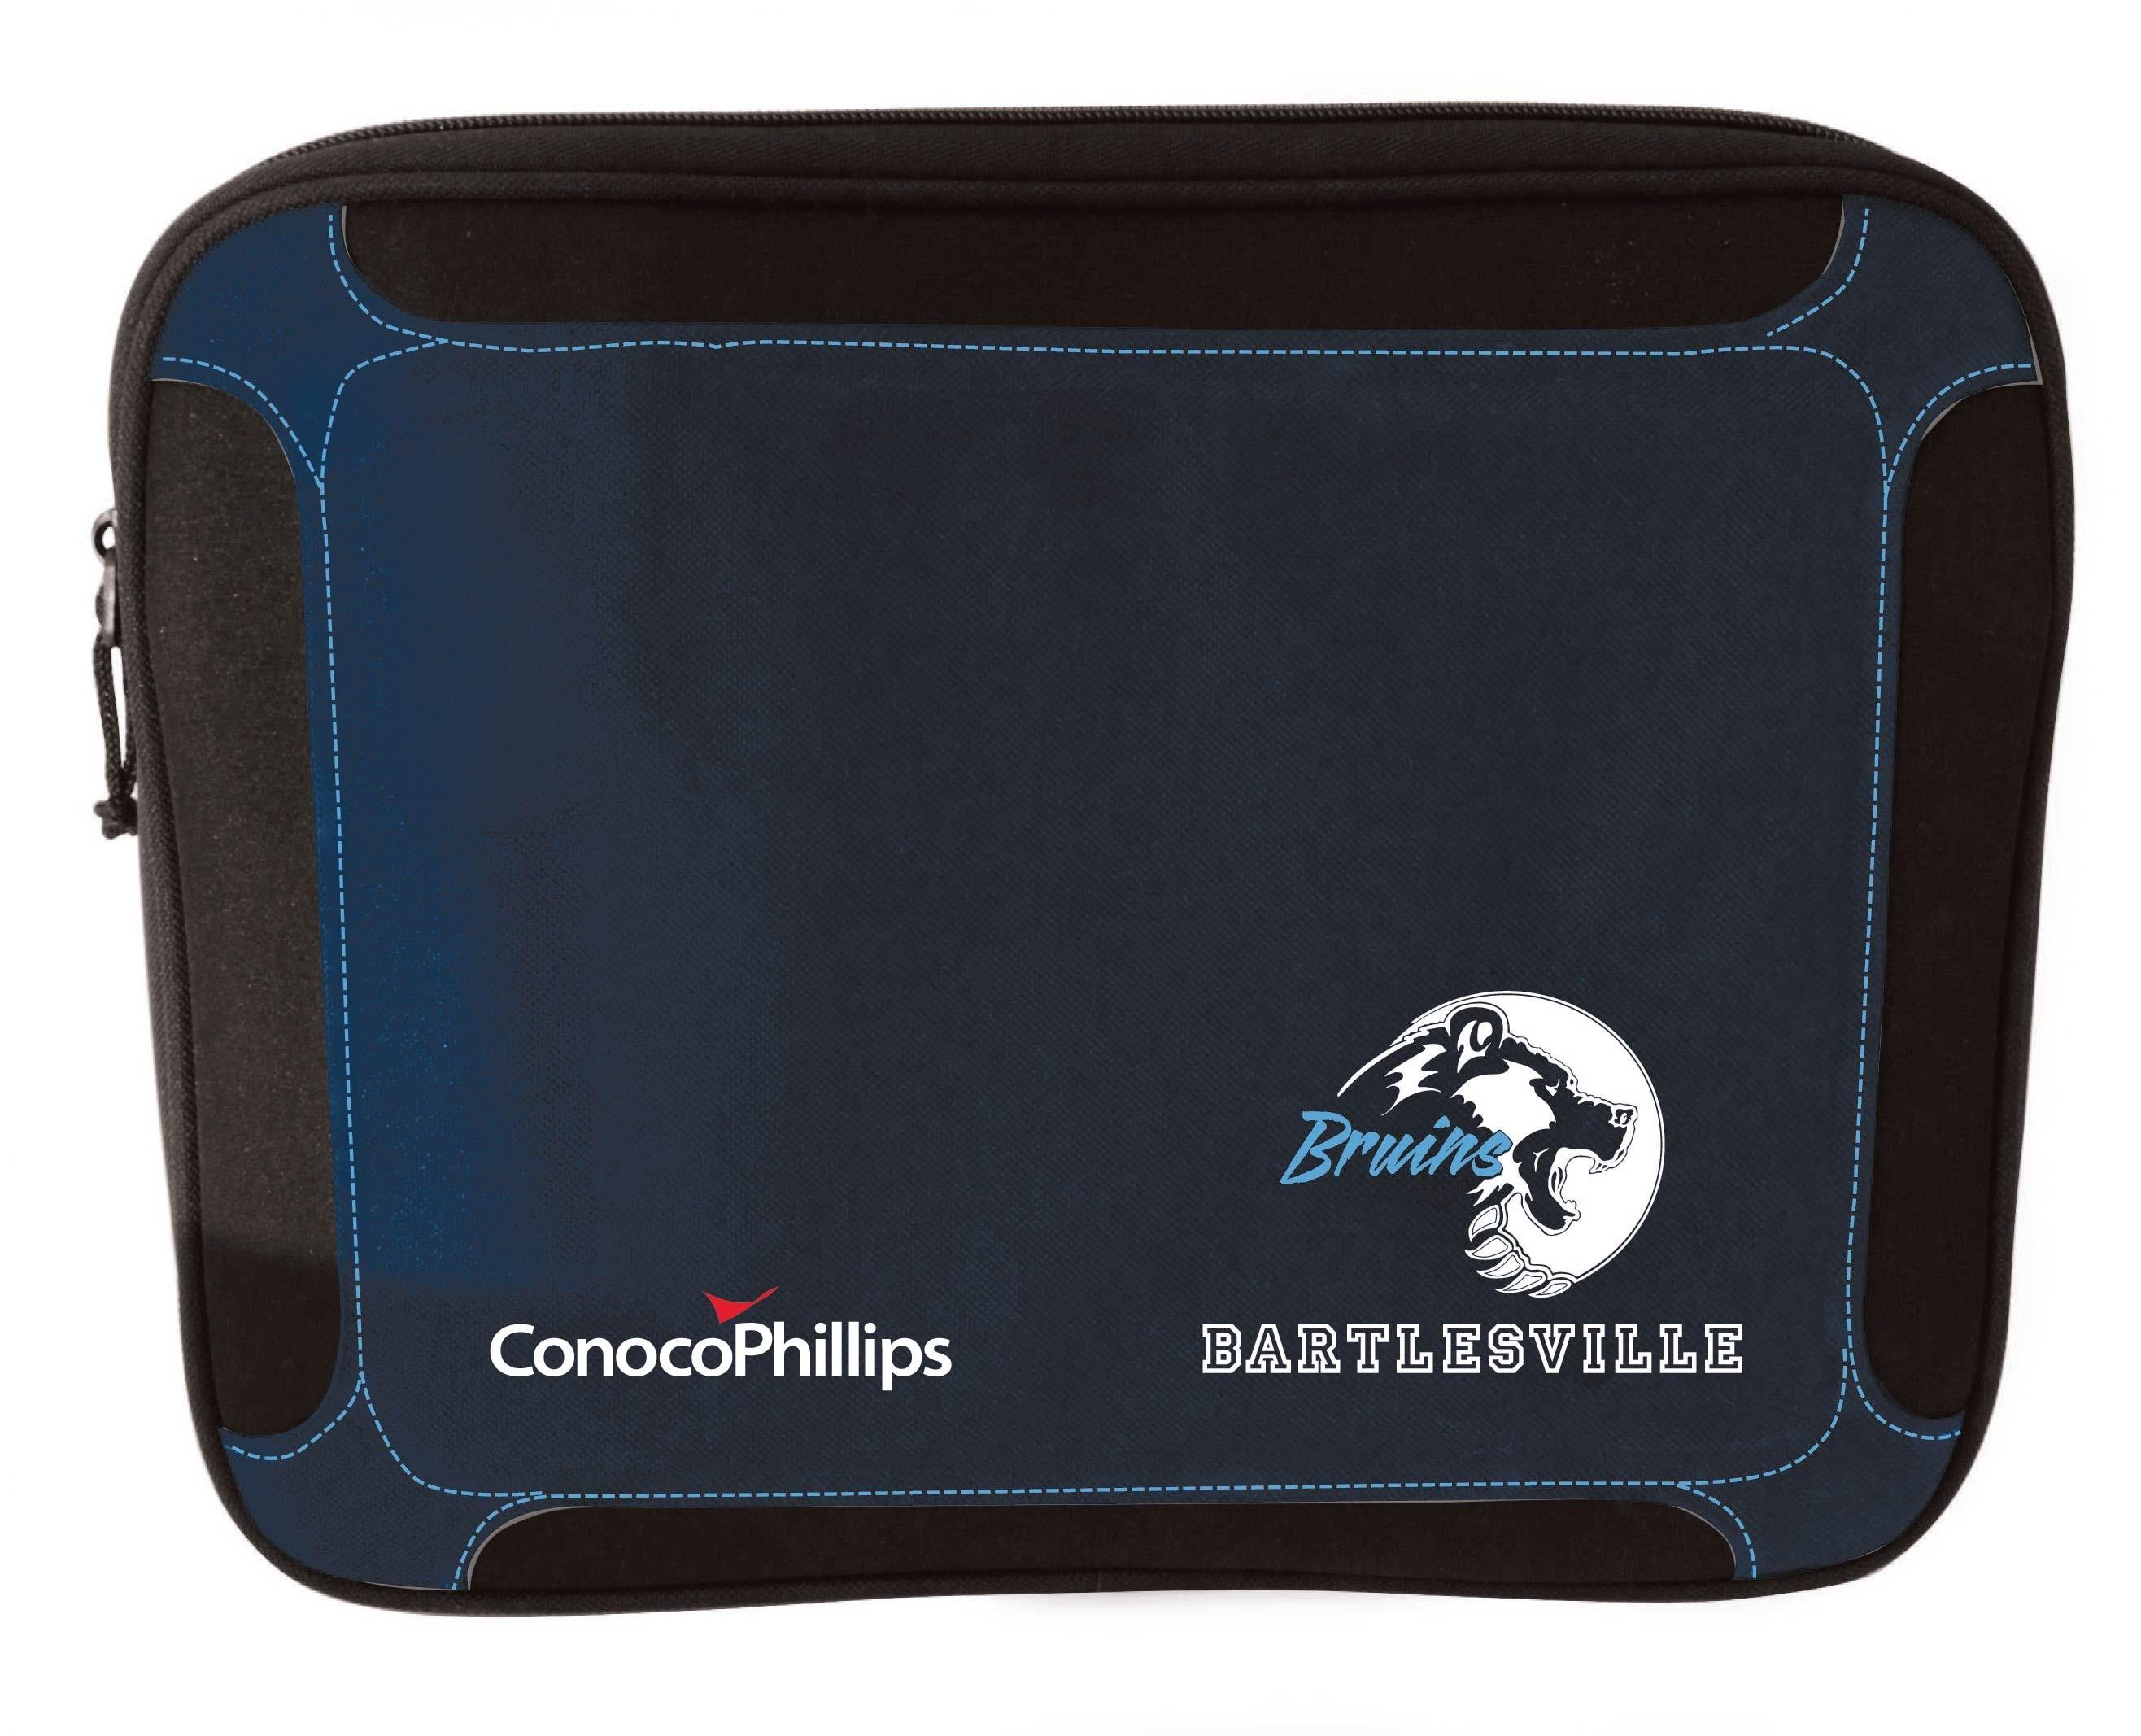 ConocoPhillips Cases